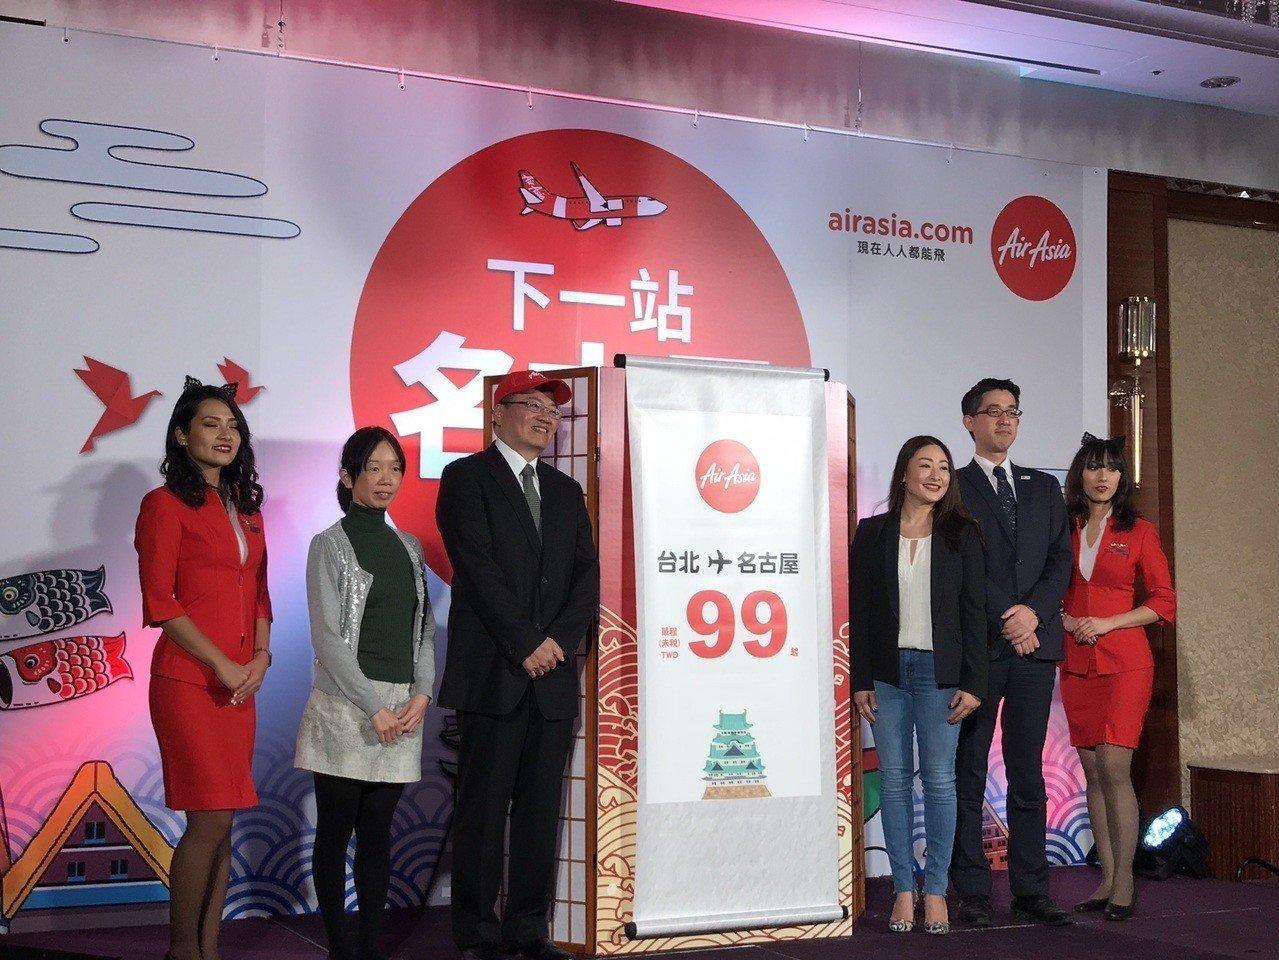 AirAsia推出台北飛名古屋航線,預計明年2月正式開航,並推出首賣優惠價99元...